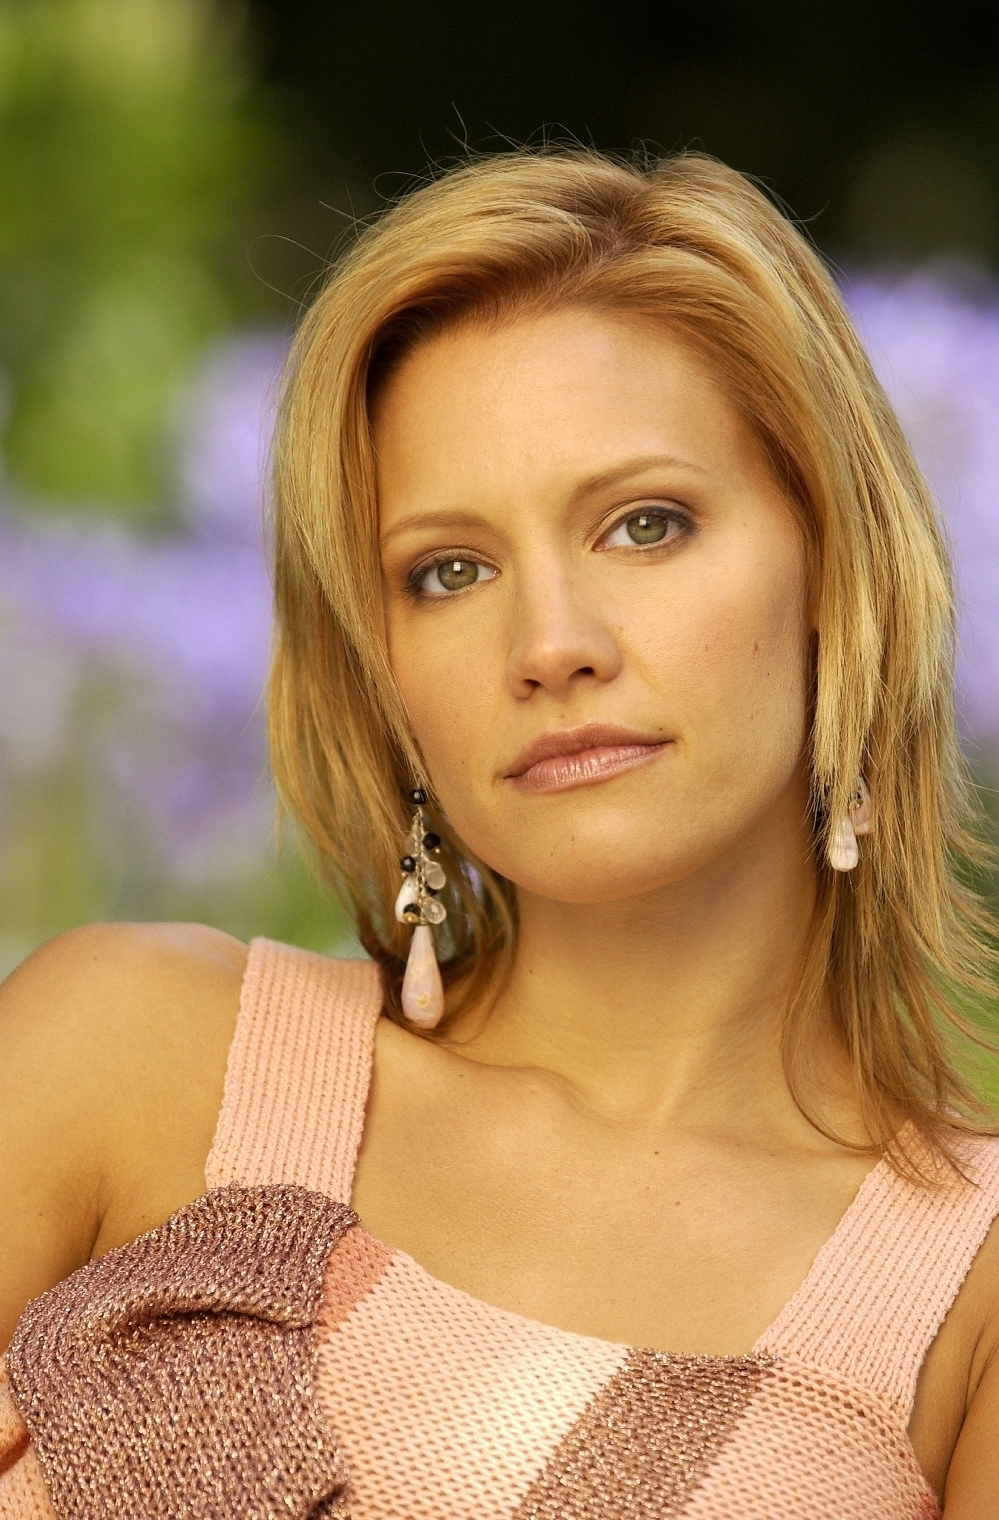 Donna Wilkes,Cynthia Farrelly Gesner Adult clips Dannielle Brent,Megumi Fujii mixed martial arts